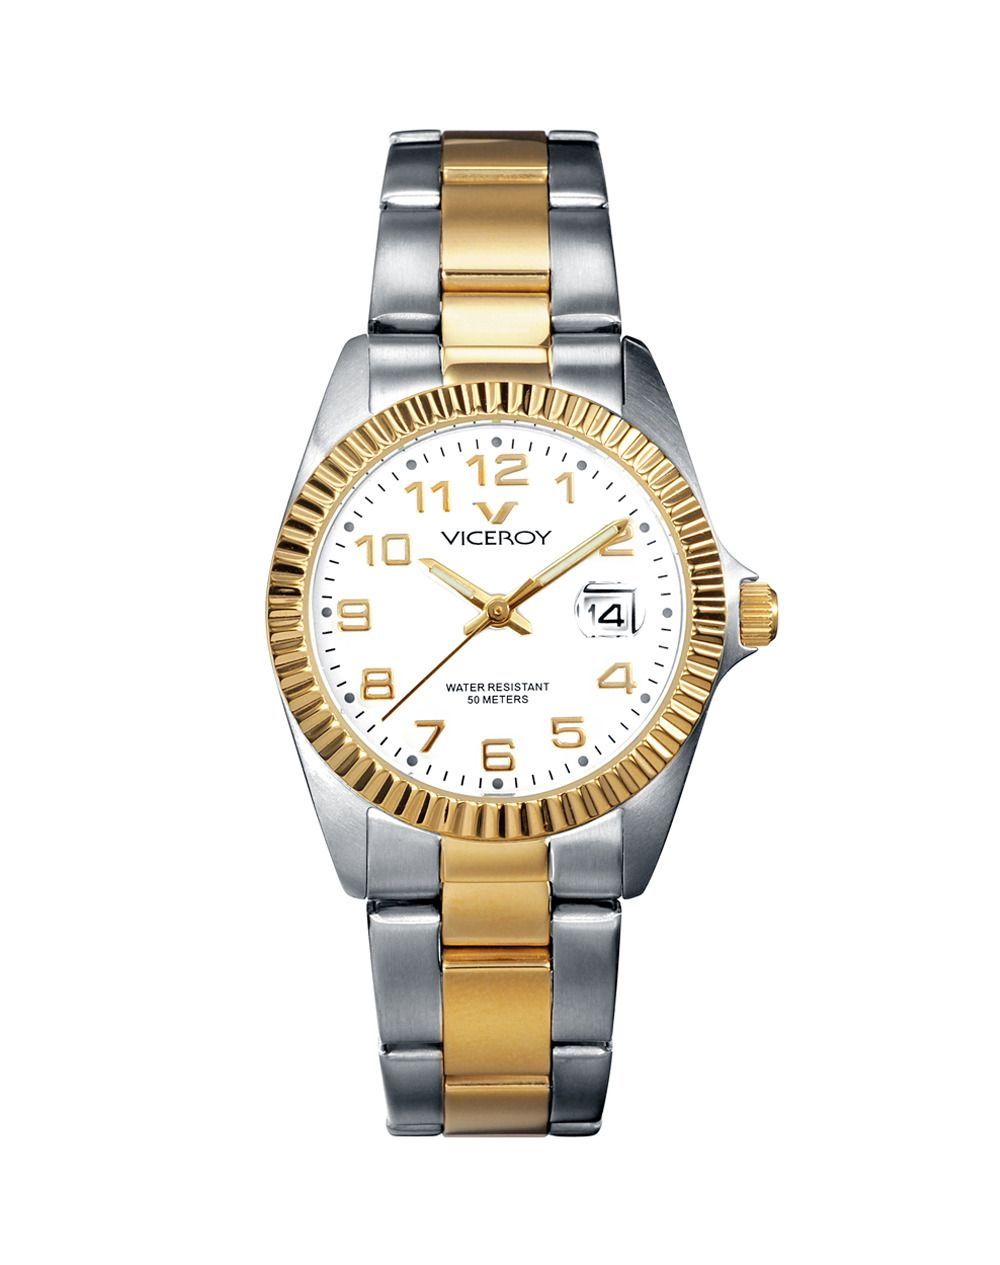 3258d7b92502 Reloj de mujer Viceroy - 79 €